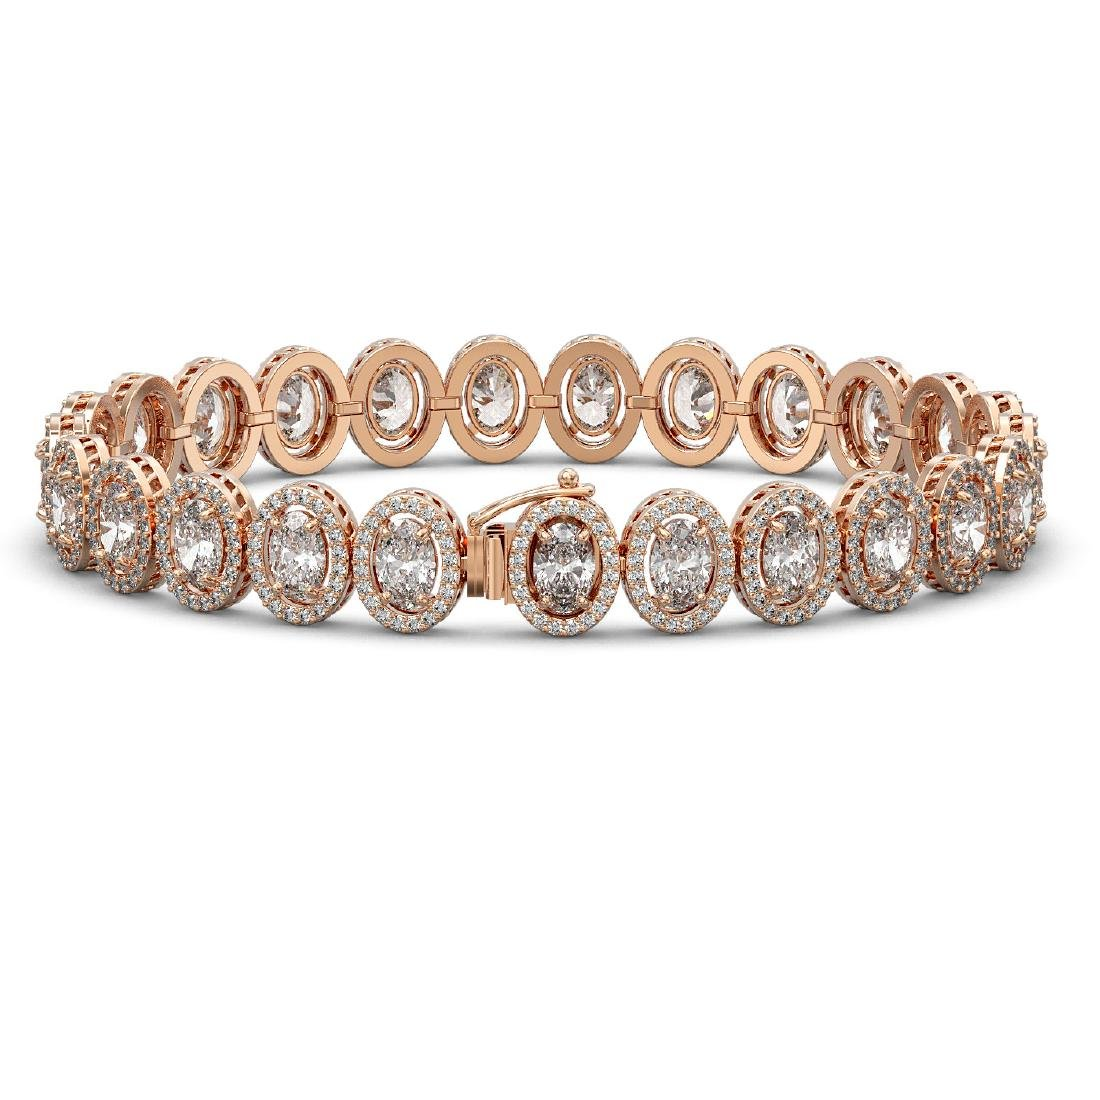 15.8 CTW Oval Diamond Designer Bracelet 18K Rose Gold - 2